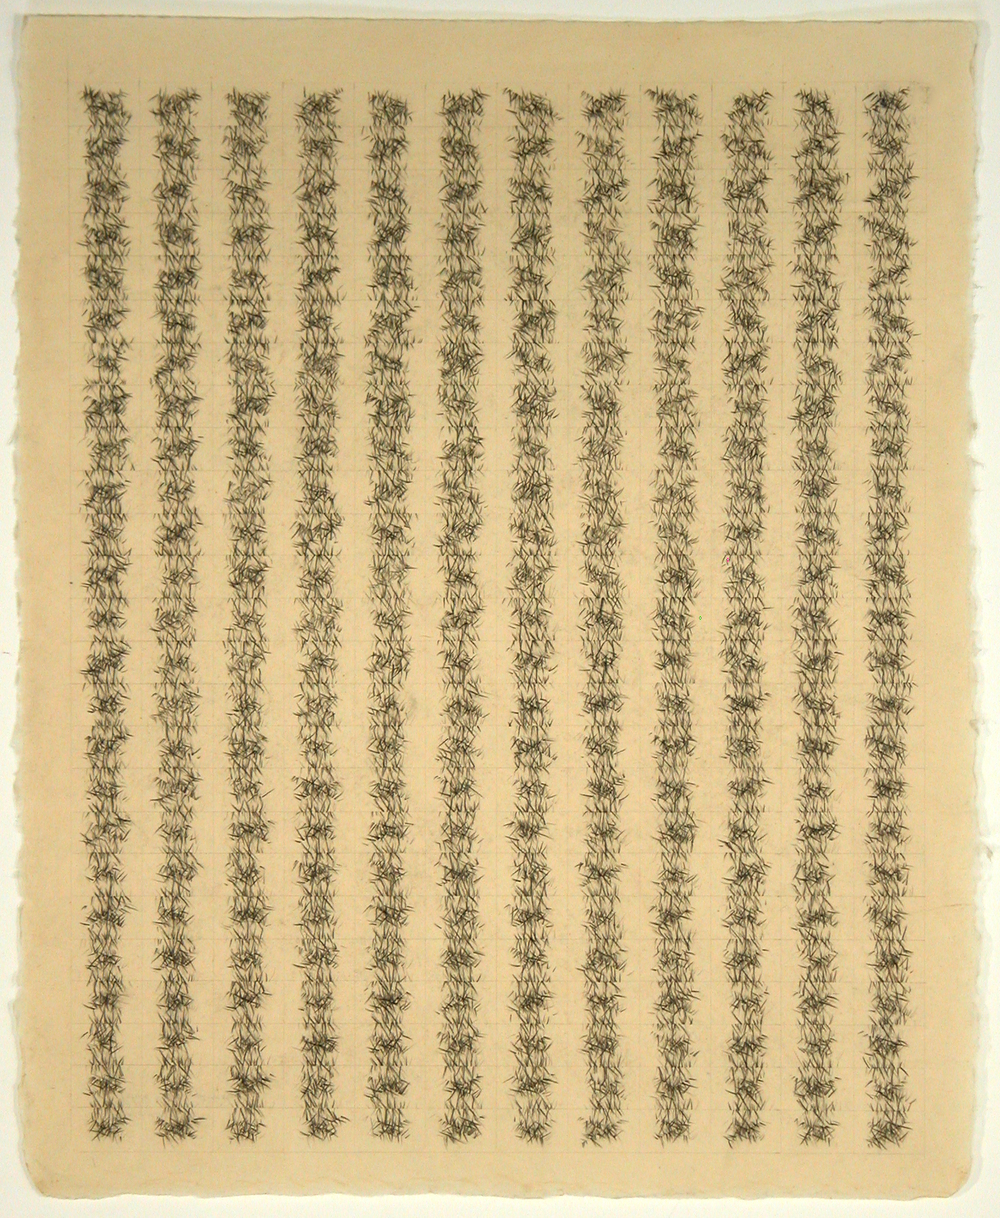 "pstme 15     Jacqueline Ott, 2001  grpahite on gampi  20.5"" x 16.5"""